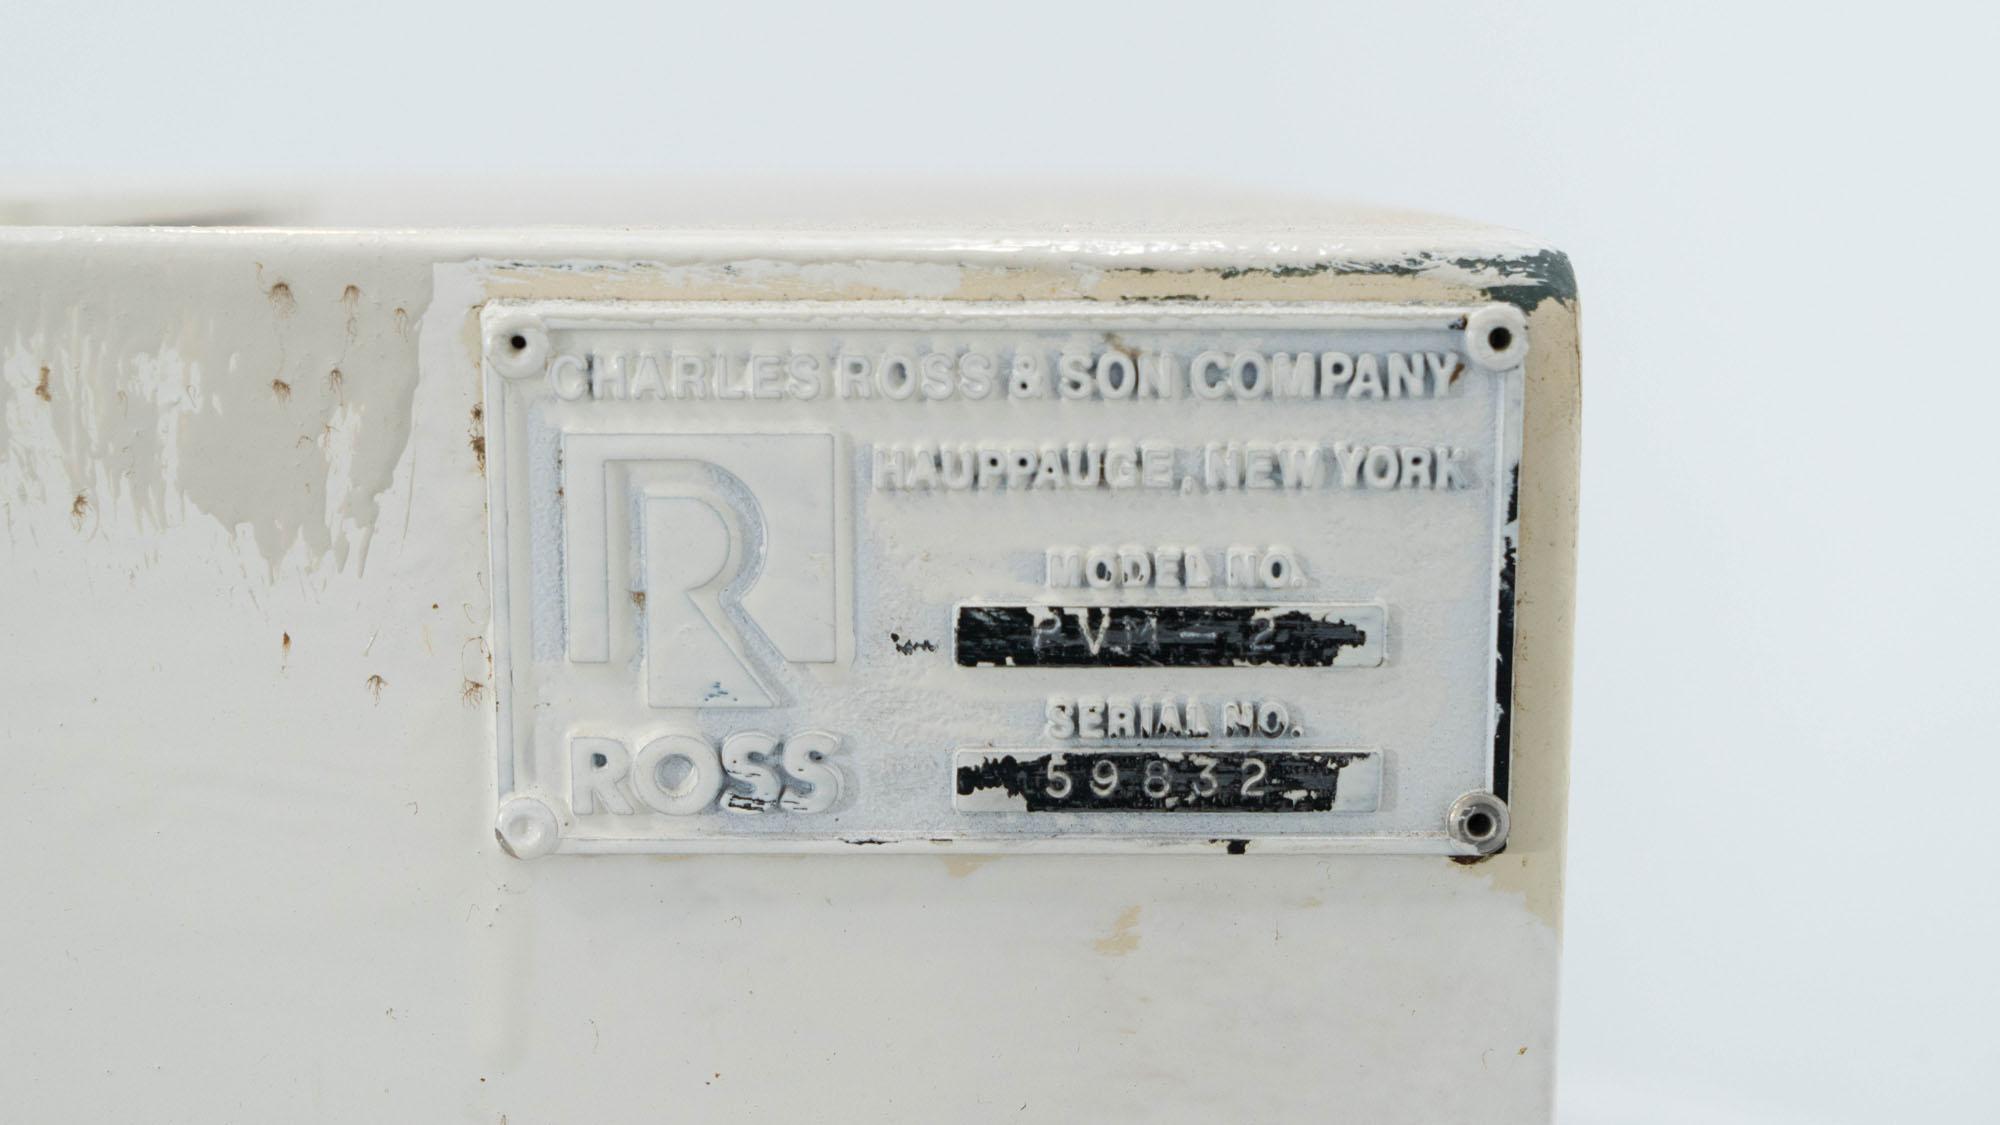 2 Gal Ross Planetary Mixer, Model PVM-2, S/S